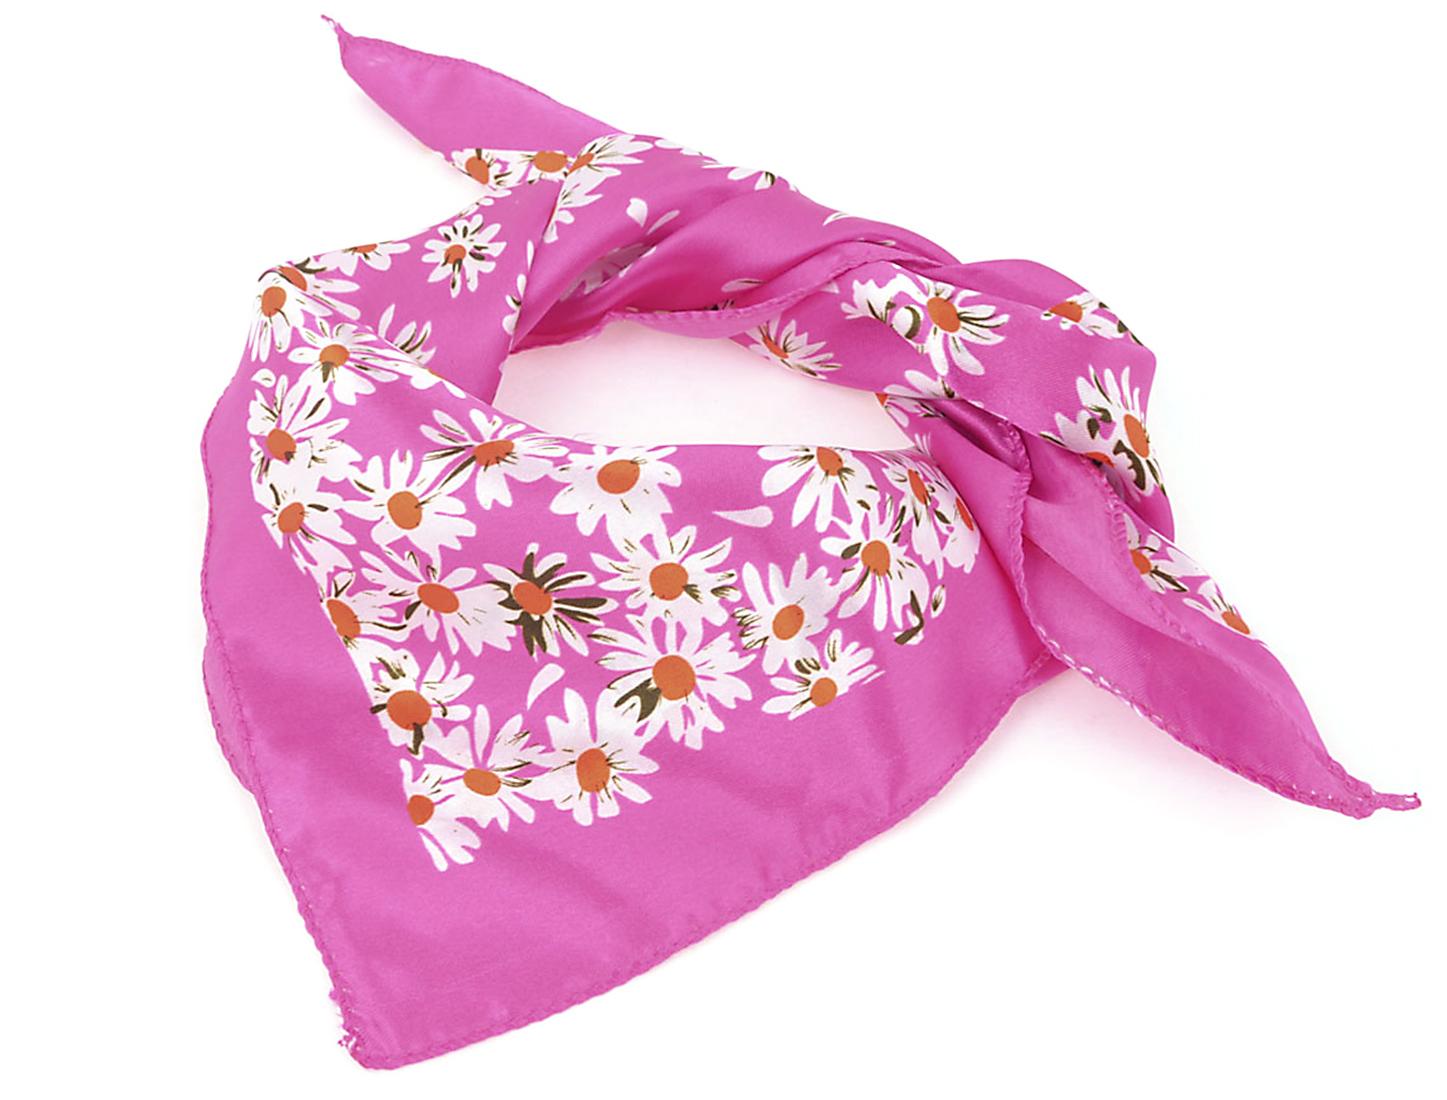 "Women Floral Daisy Print Polyester Square Kerchief Ornament Fuchsia 20""x20"""